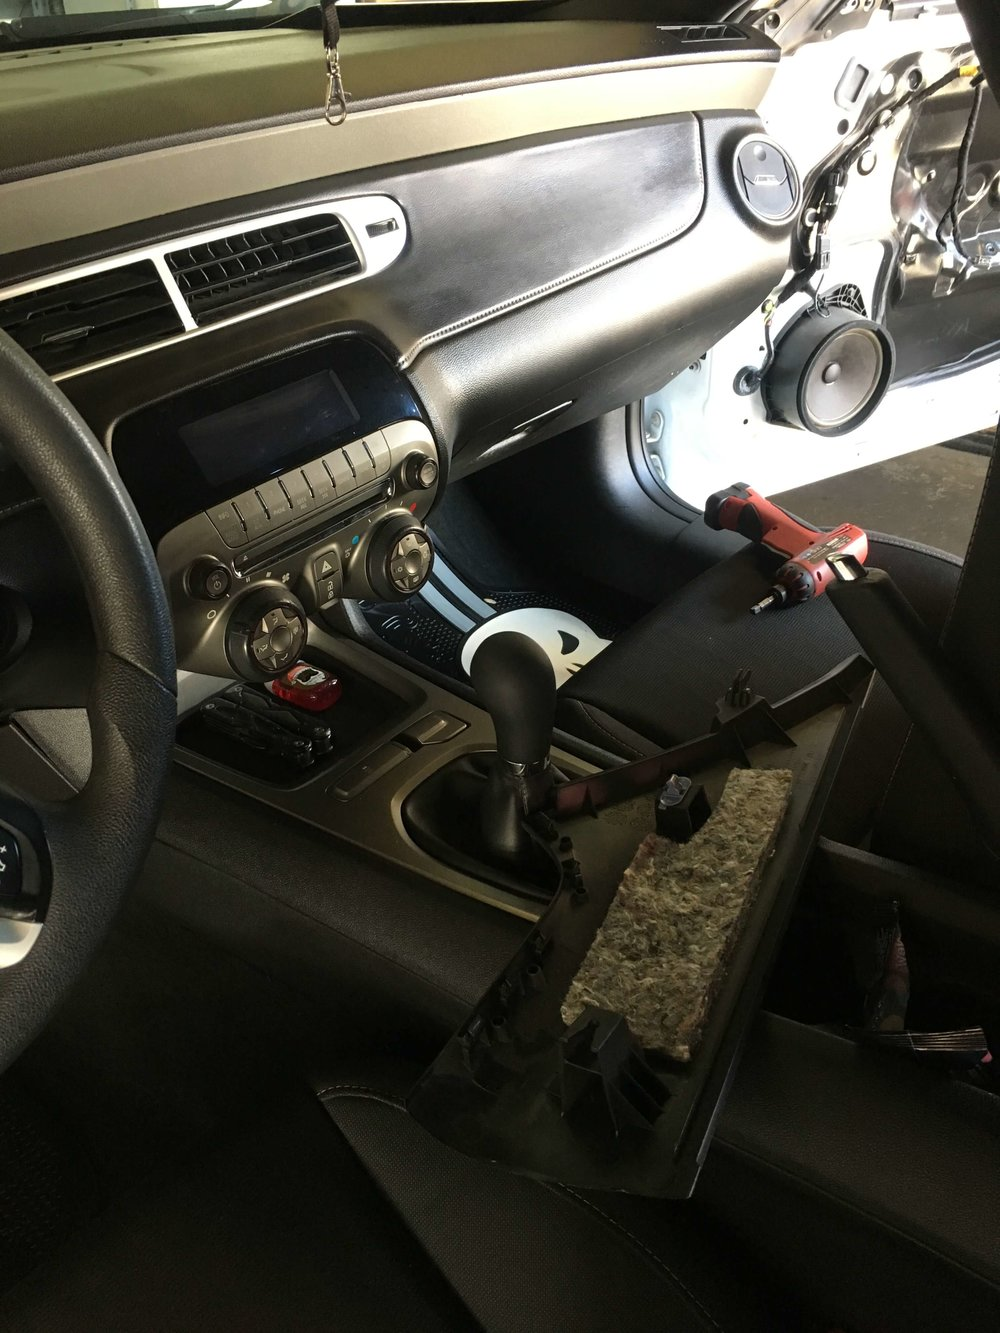 Escondido Custom Car Parts and Auto Accessories